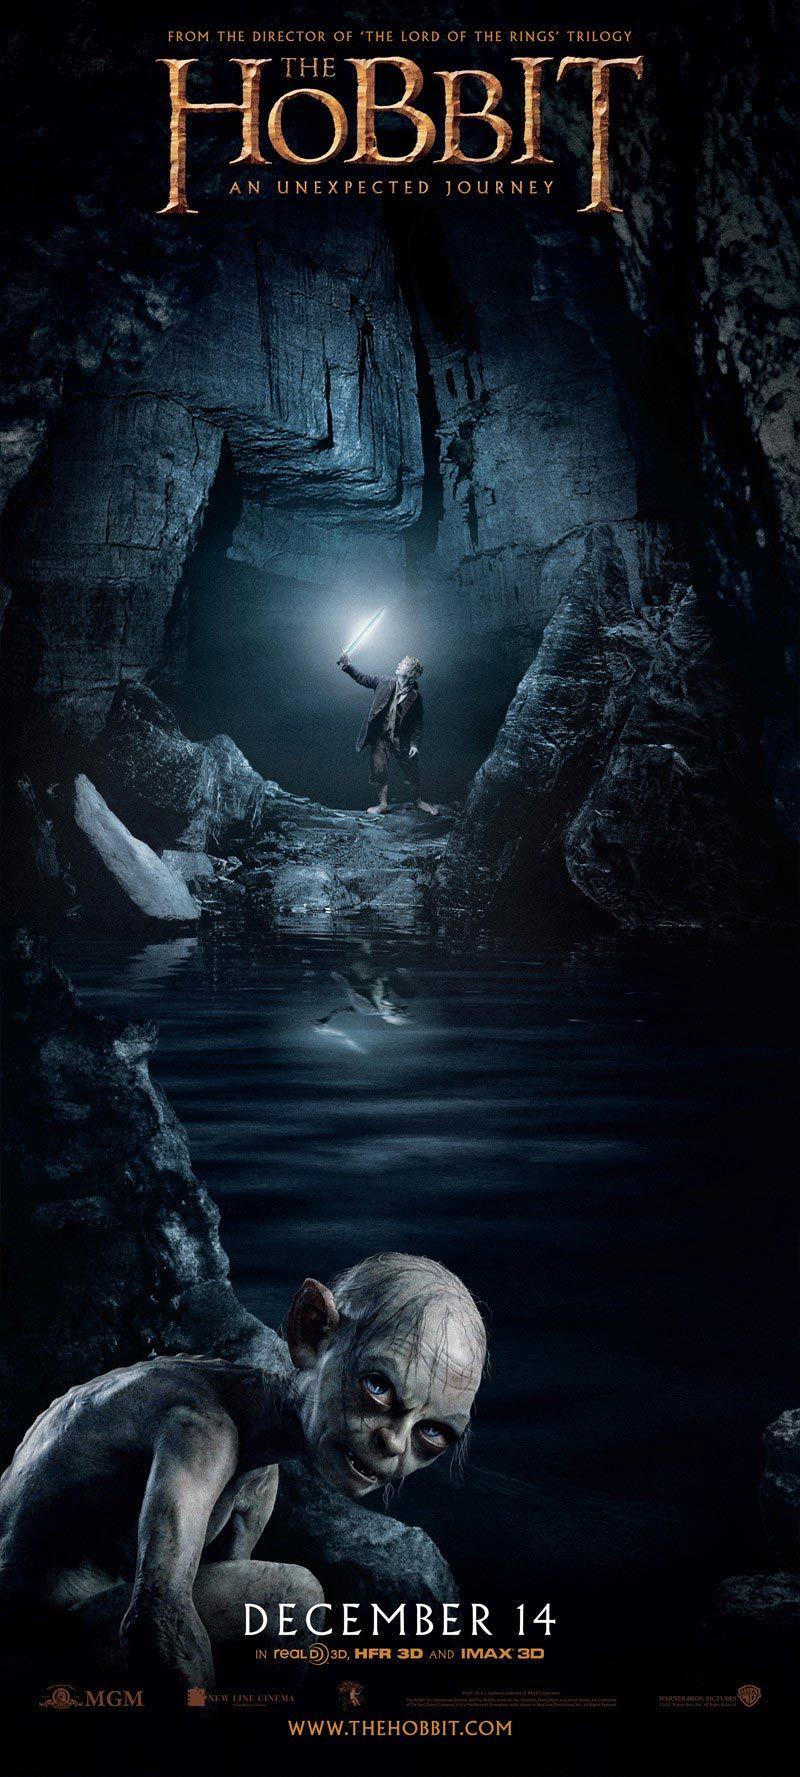 the hobbit an unexpected journey | the hobbit an unexpected journey new international tv spot the hobbit ...